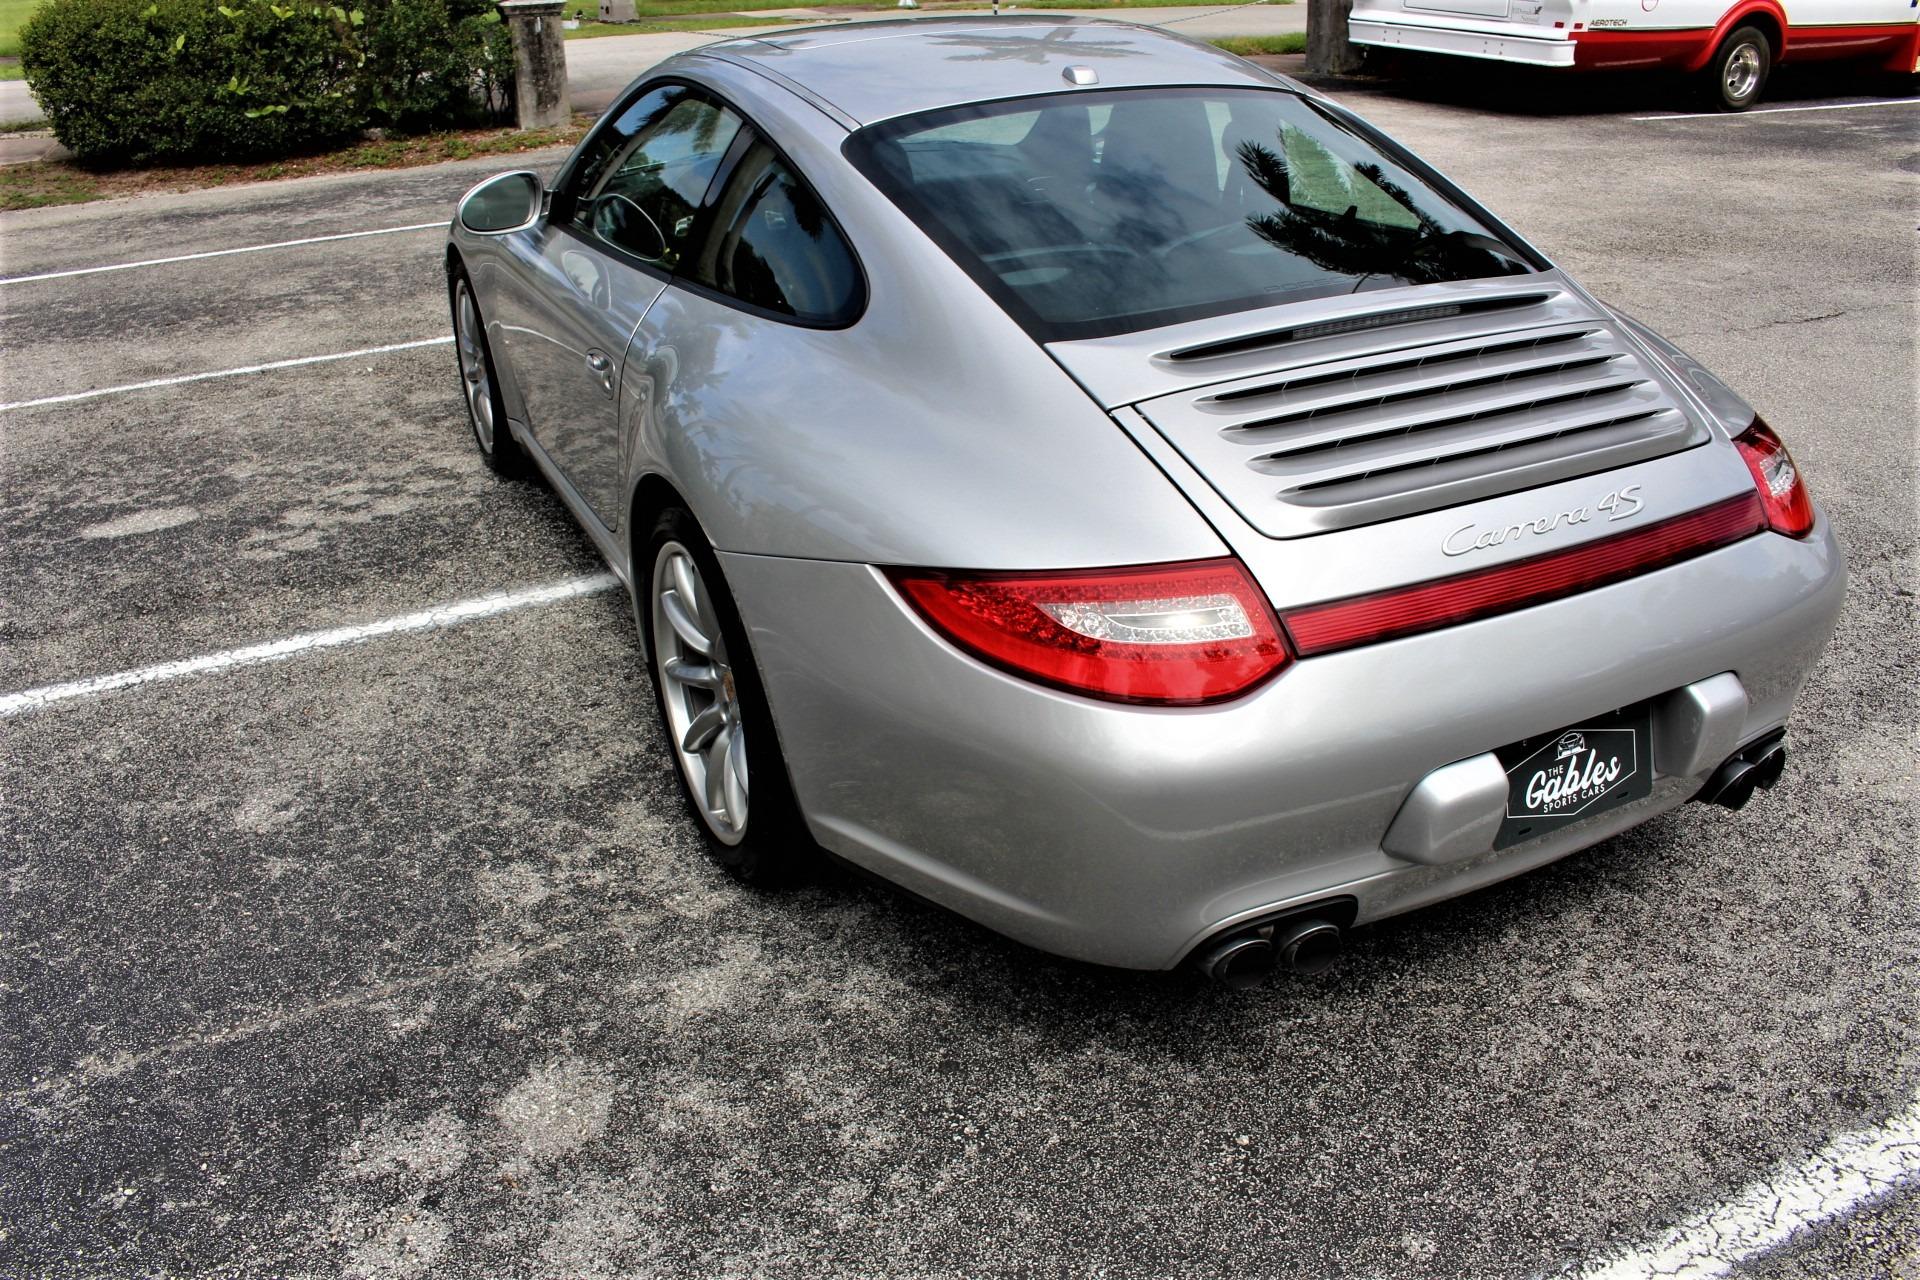 Used 2009 Porsche 911 Carrera 4S for sale $68,850 at The Gables Sports Cars in Miami FL 33146 3